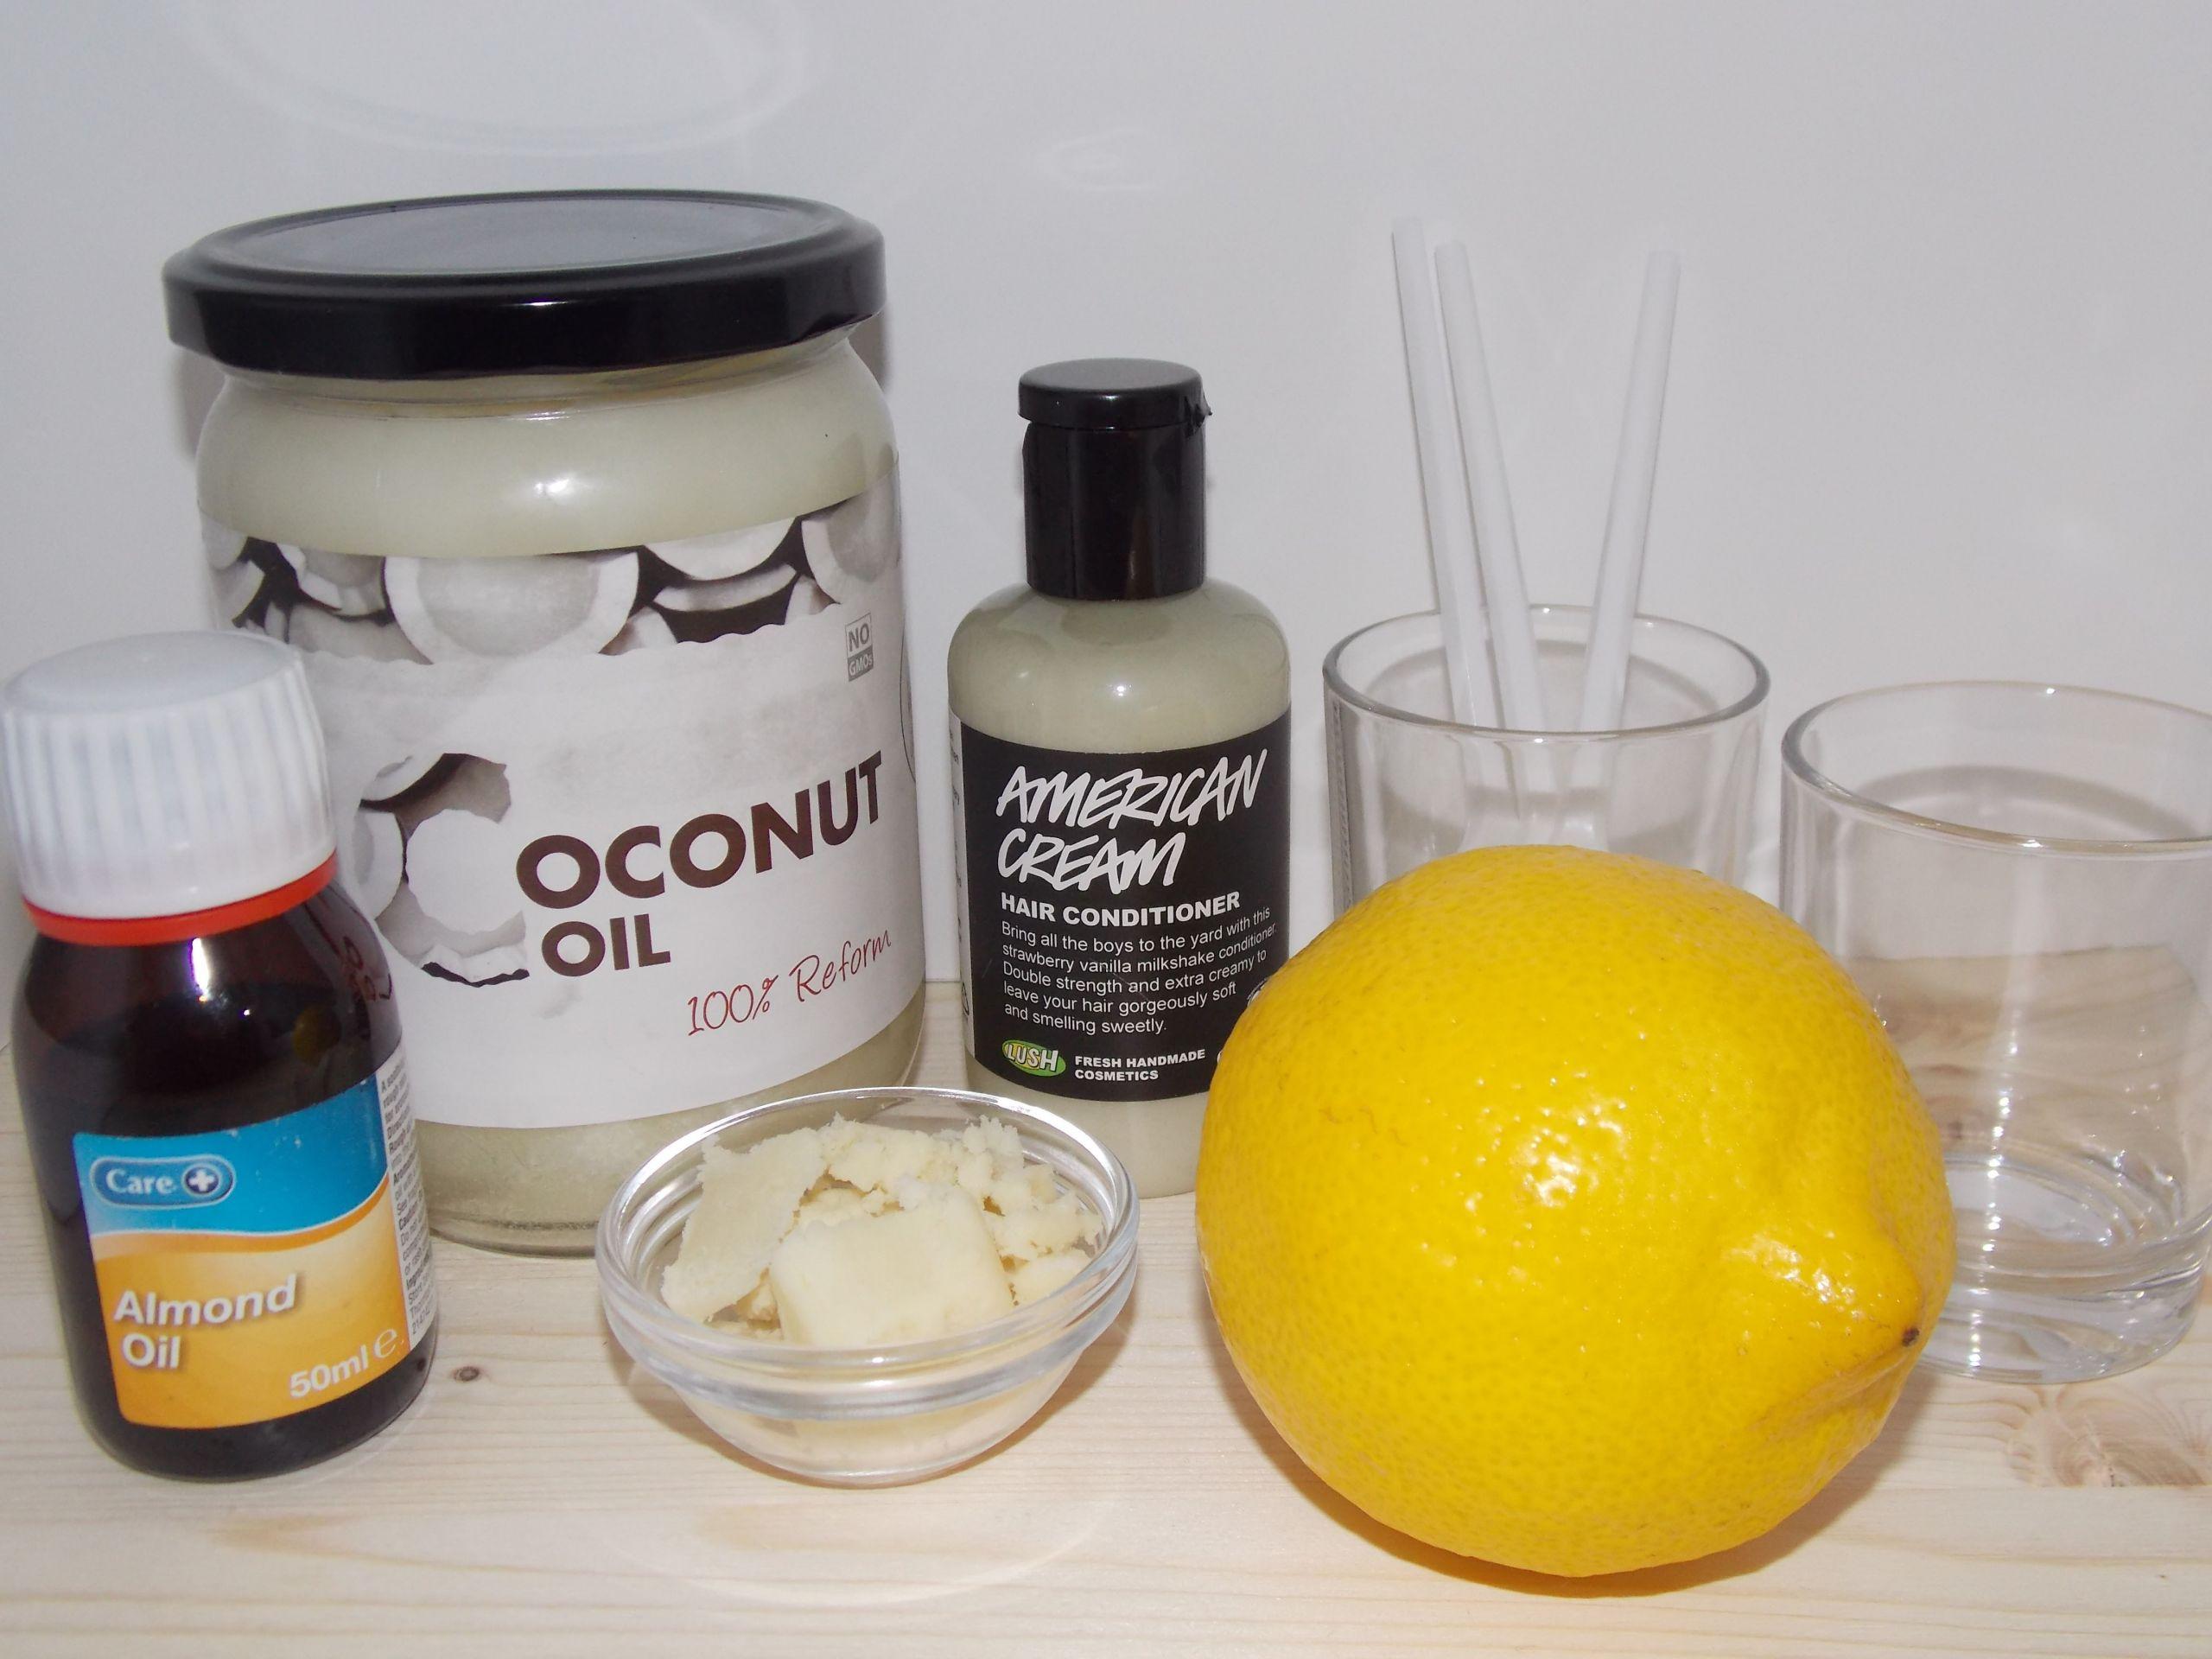 DIY Hot Oil Treatment For Damaged Hair  LUSHpiration – Damaged Hot Oil Treatment DIY